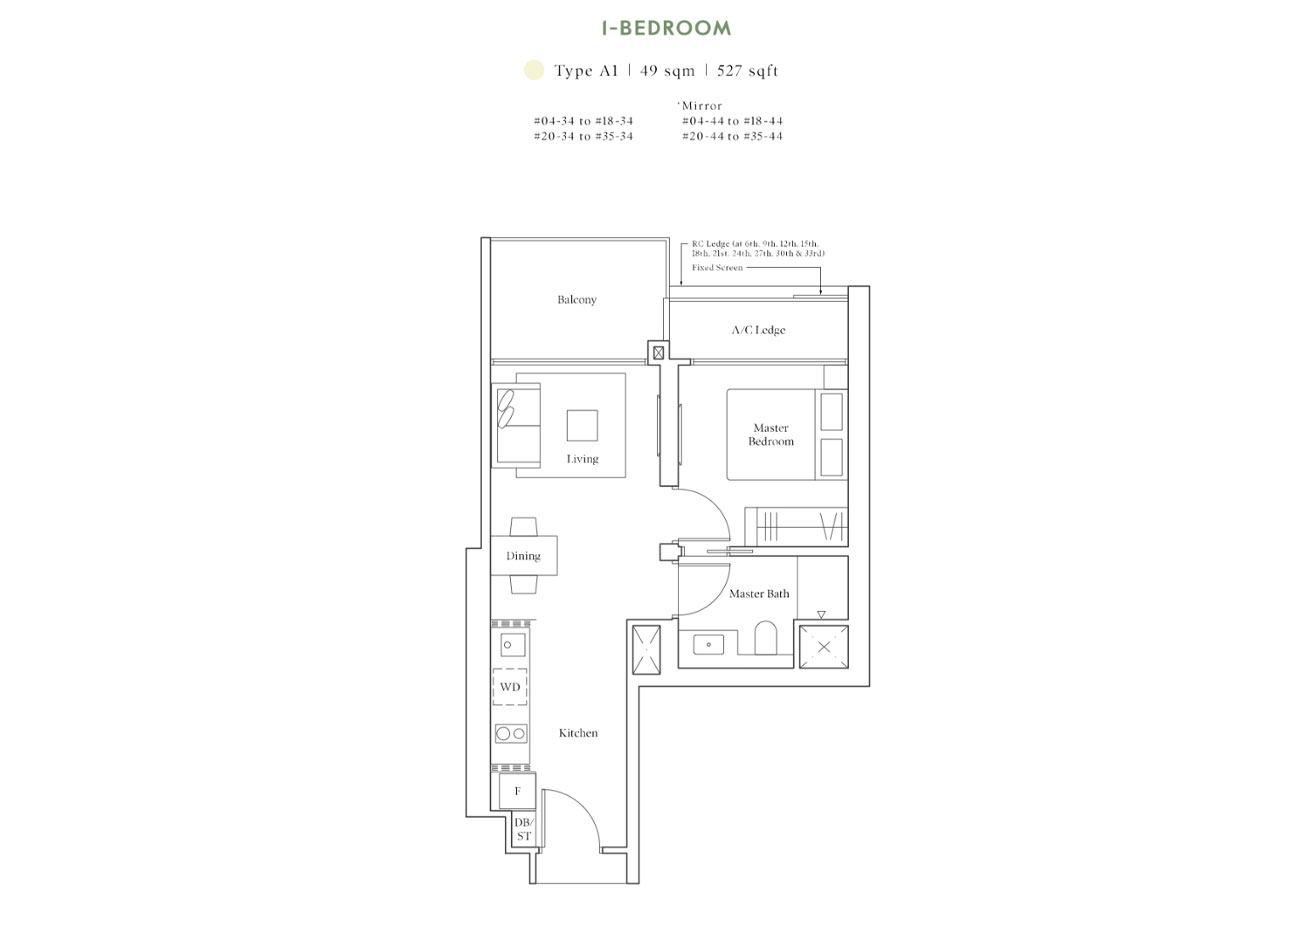 Horizon Collection - 1 Bedroom, A1